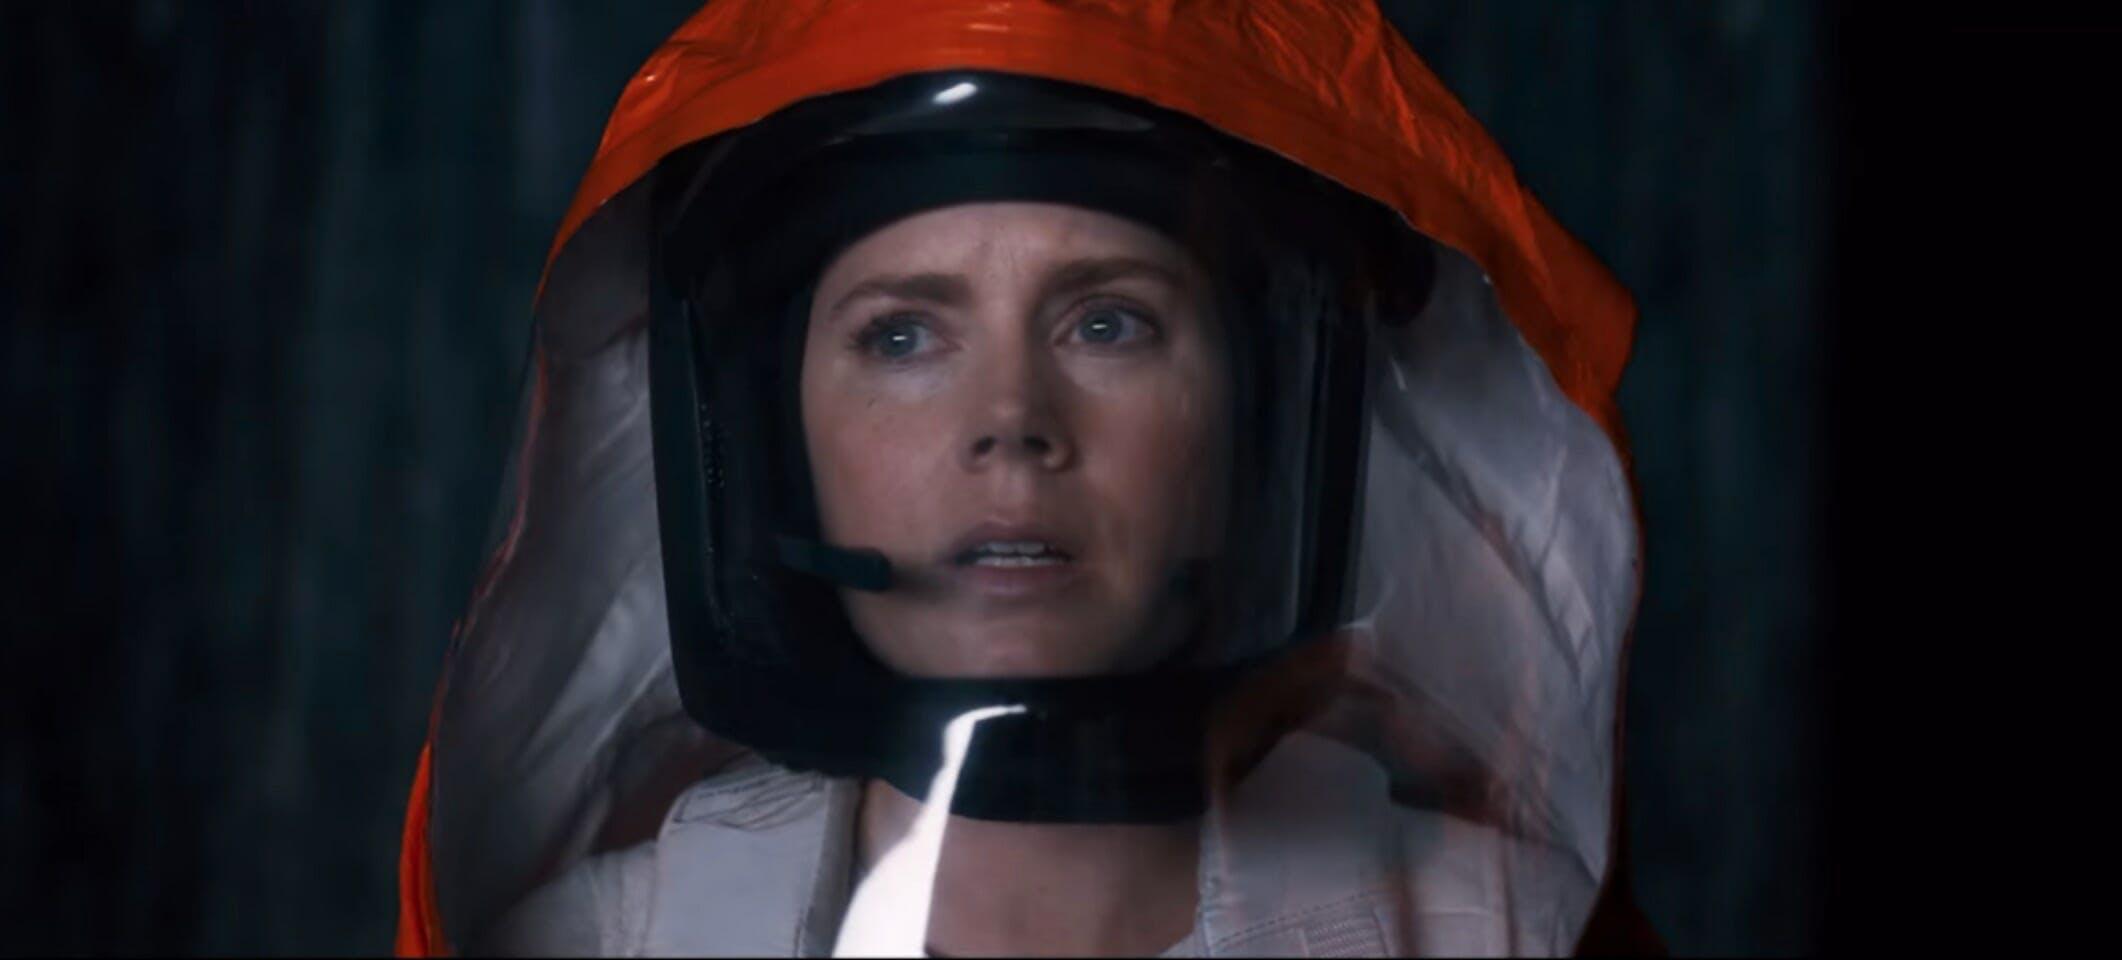 alien movies on amazon prime - arrival